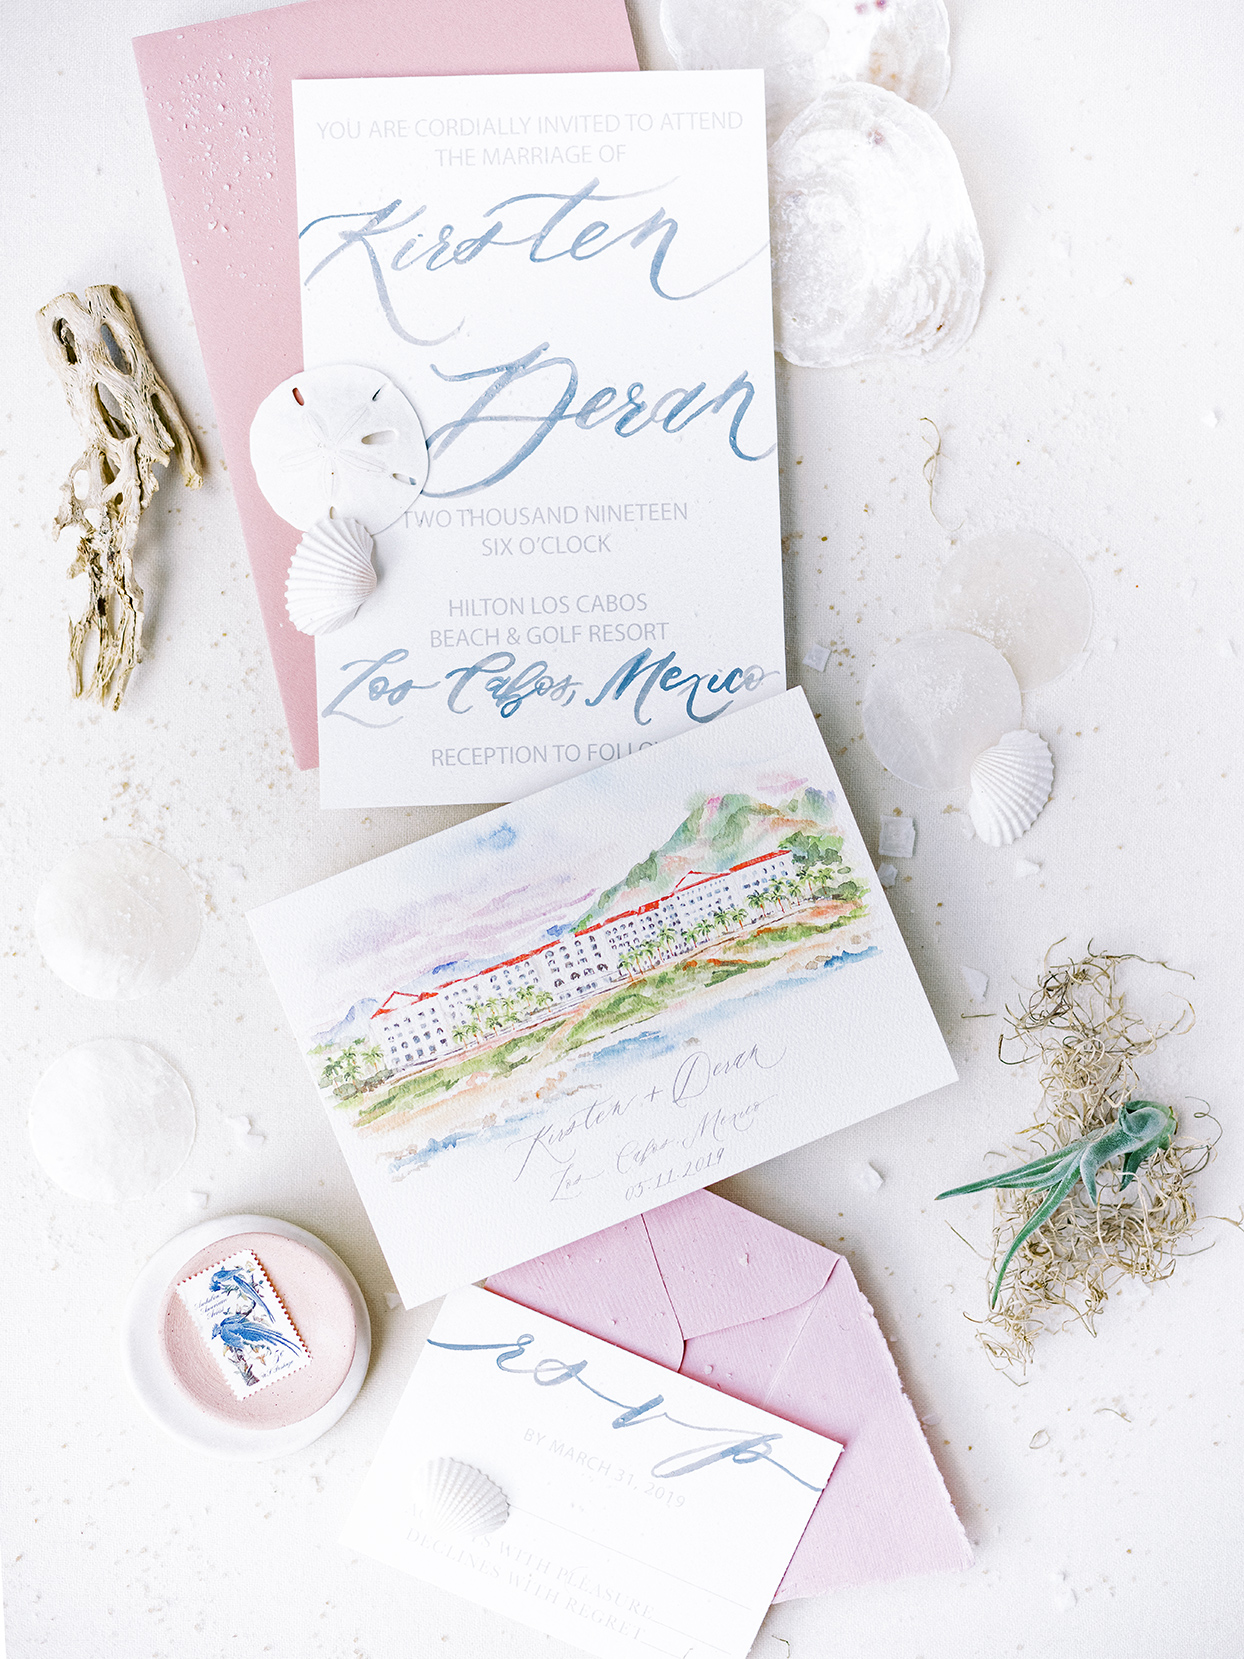 kirsten deran wedding invites watercolor pink and blue